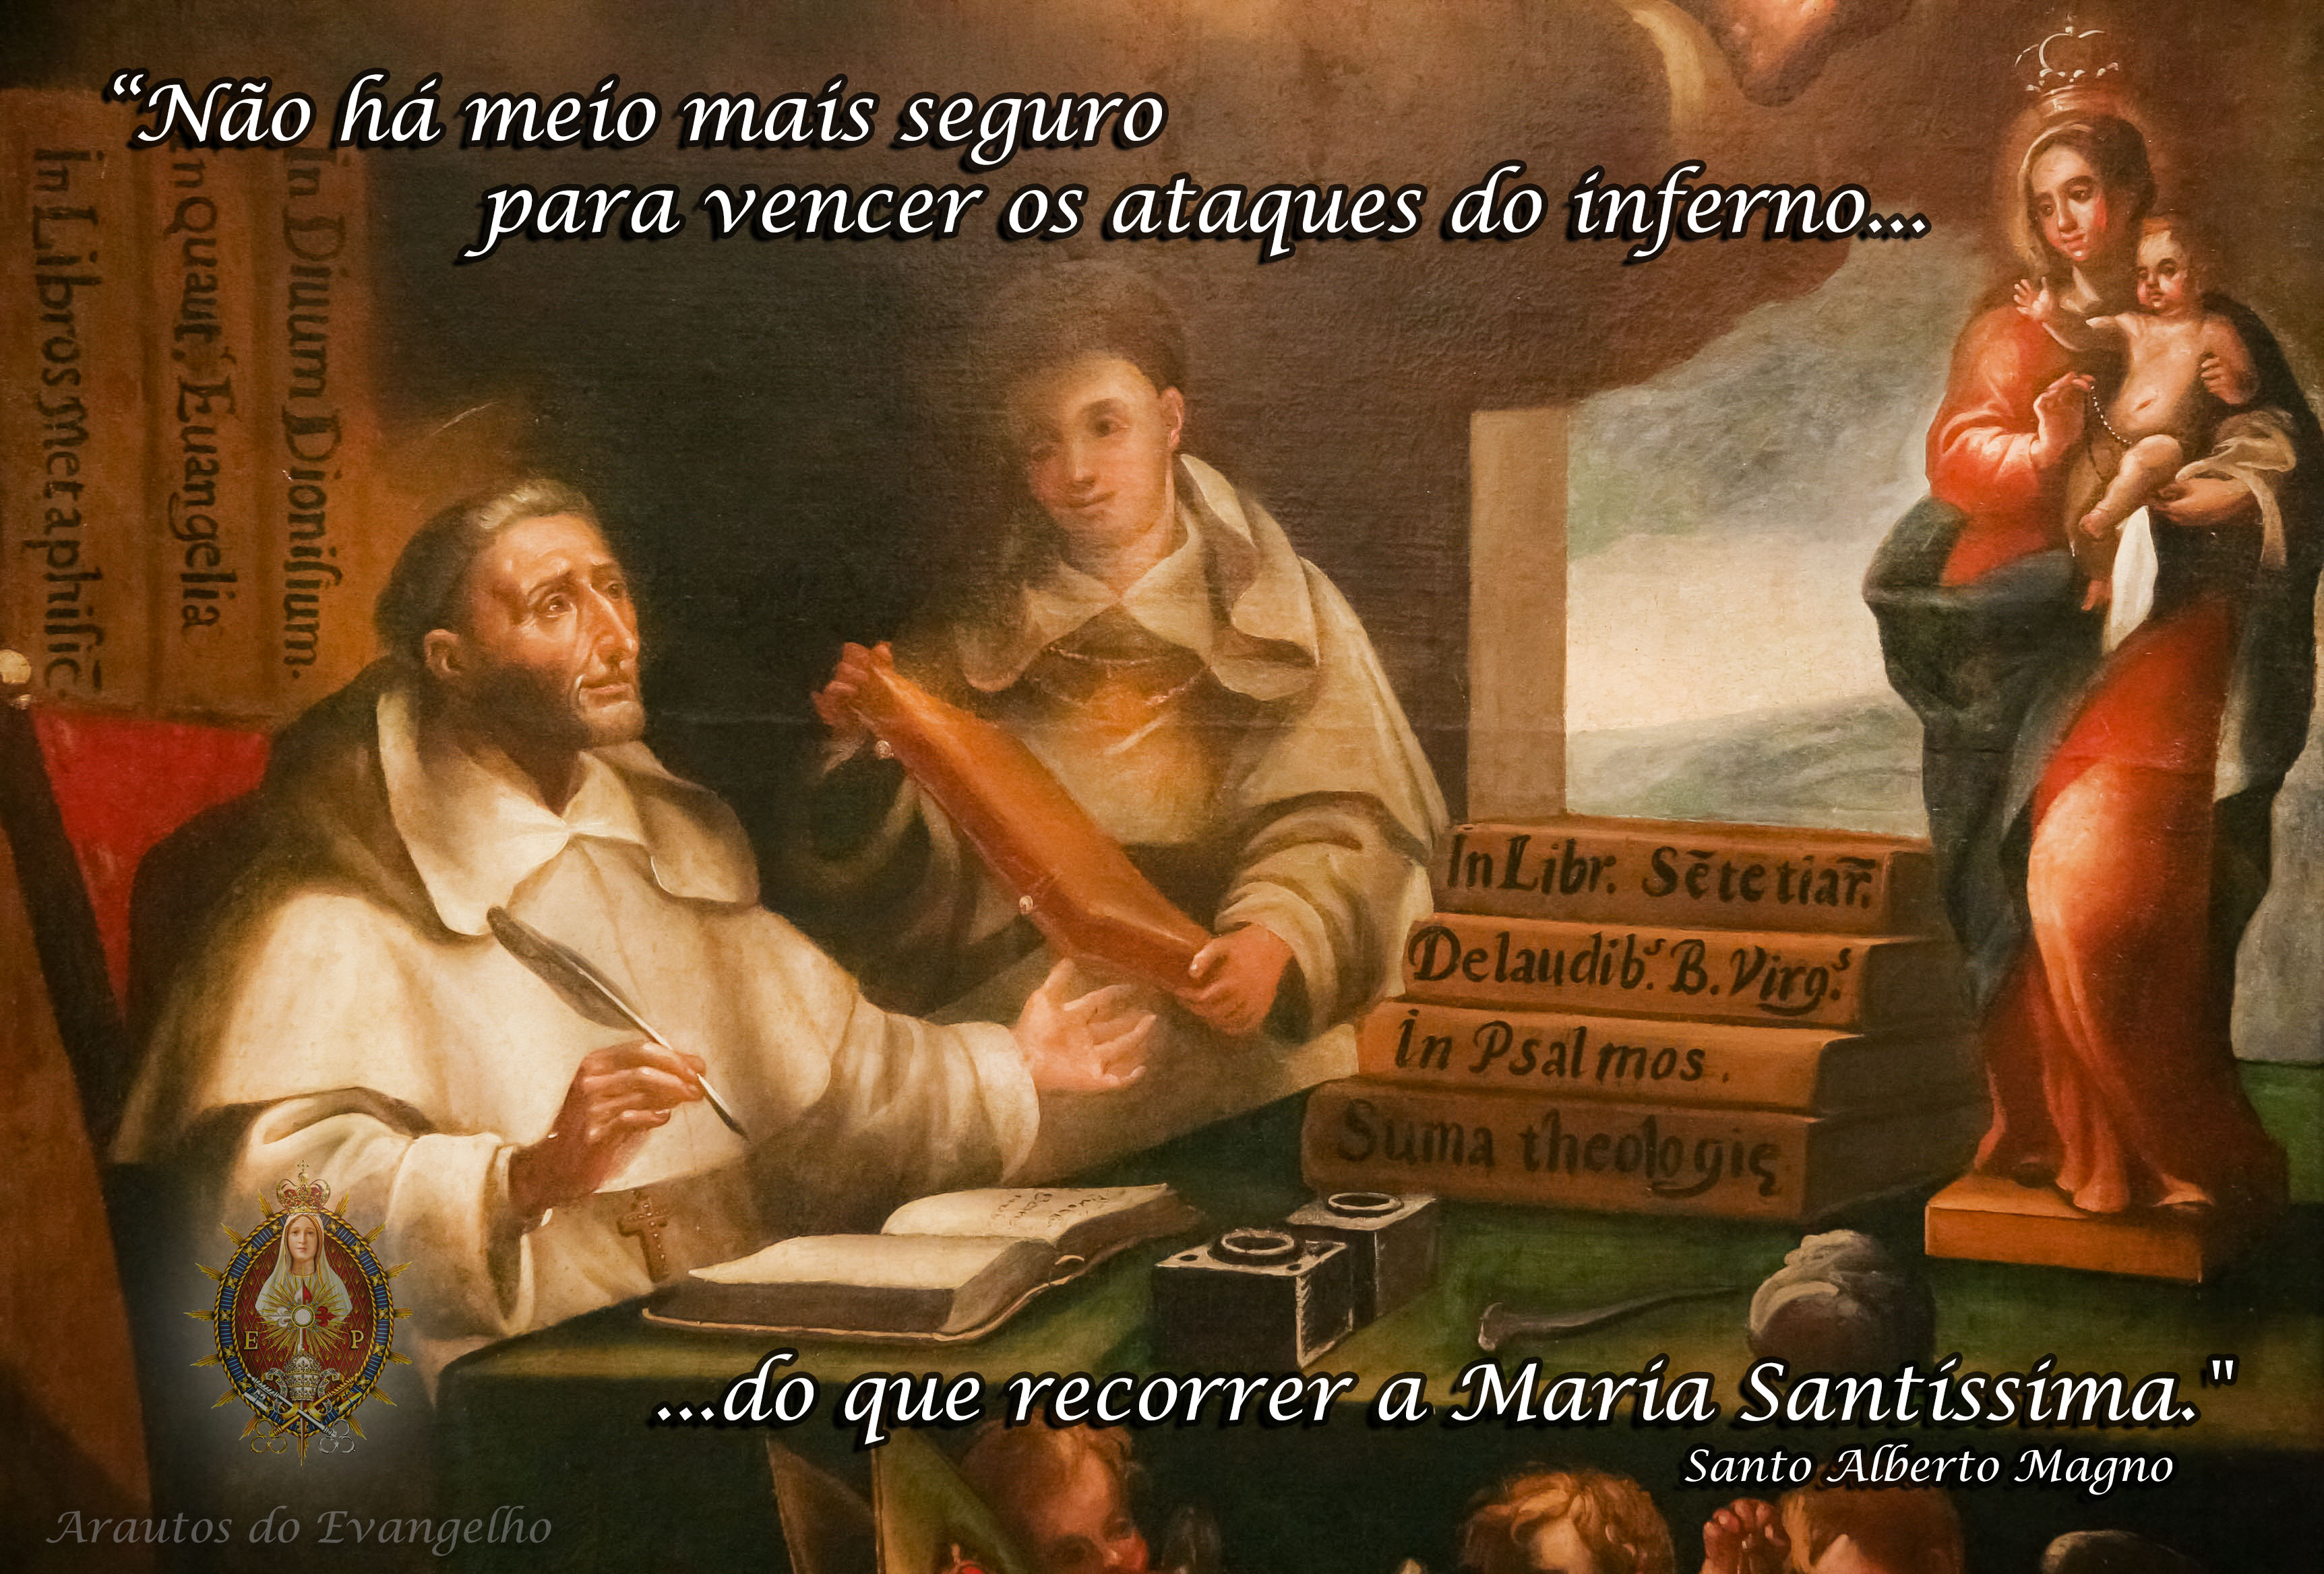 15 de Novembro – Dia de Santo Alberto Magno